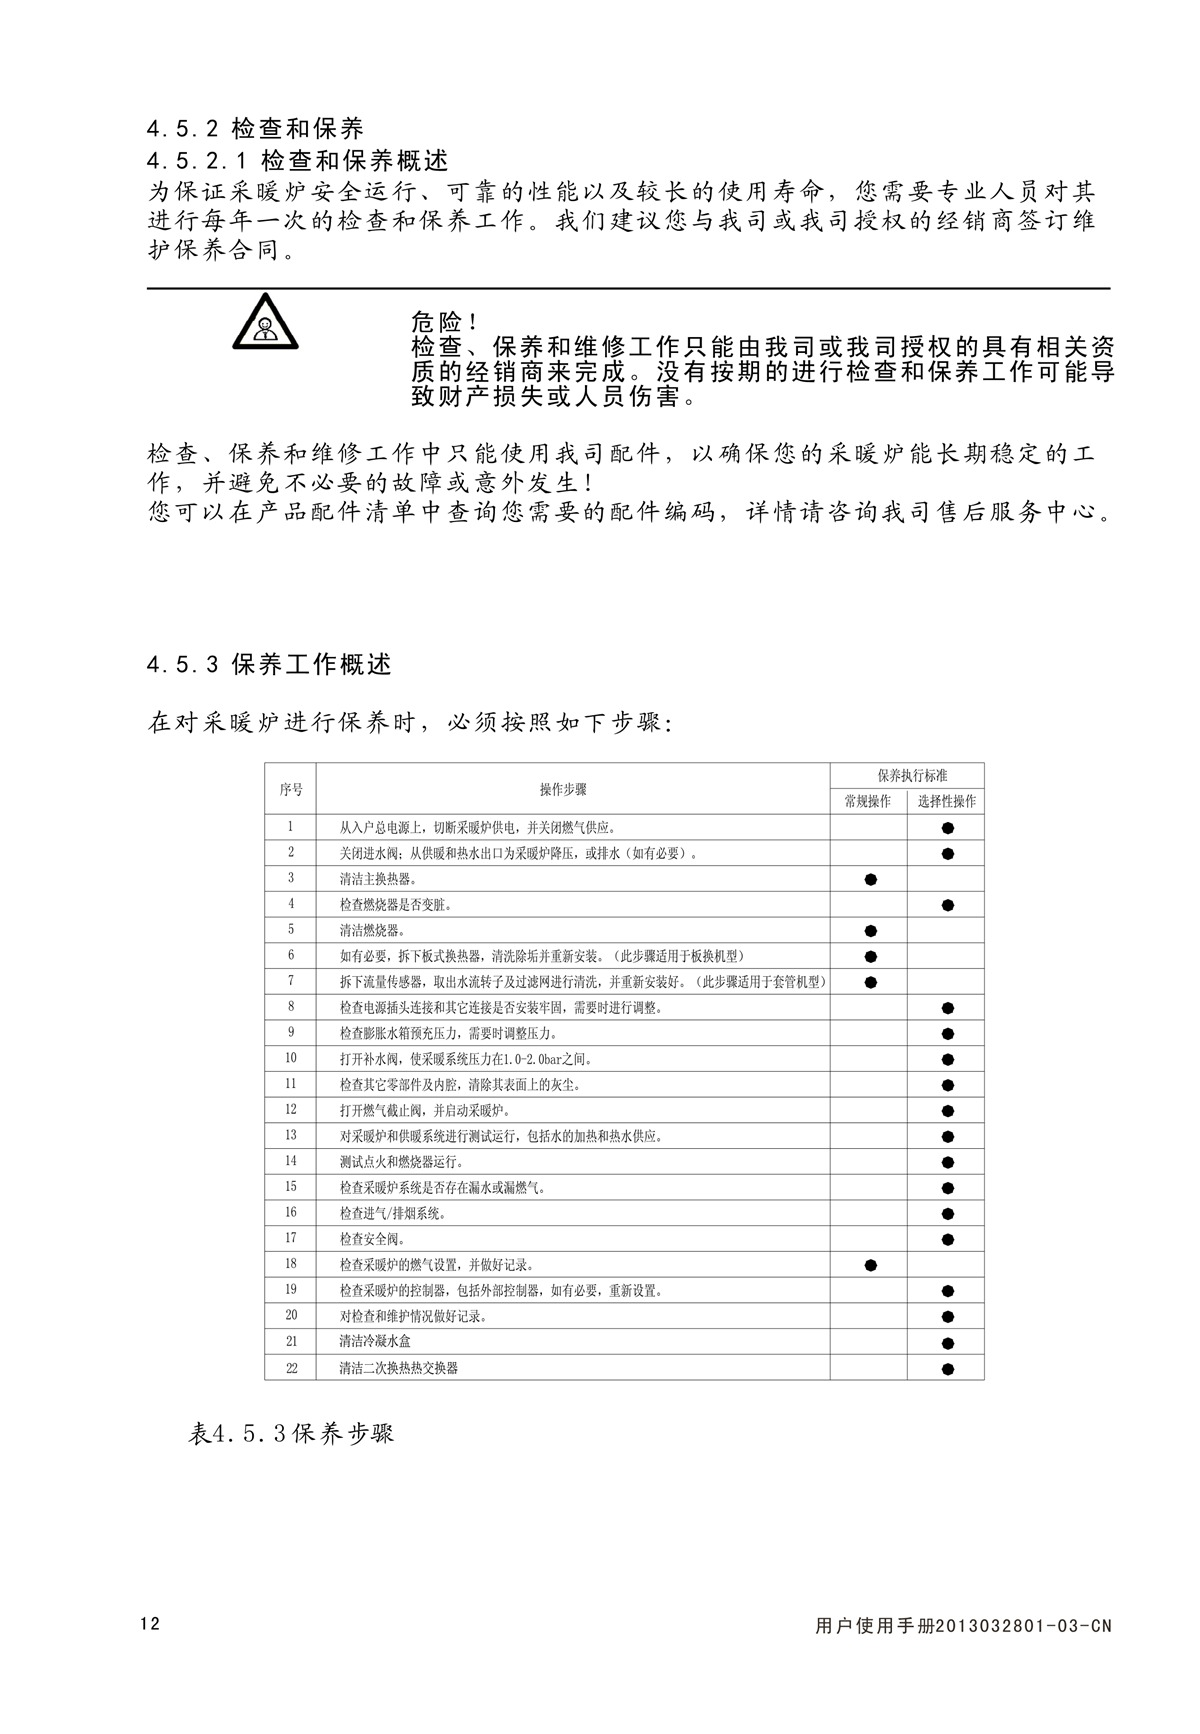 ES16B系列-用户使用手册-6_01.jpg